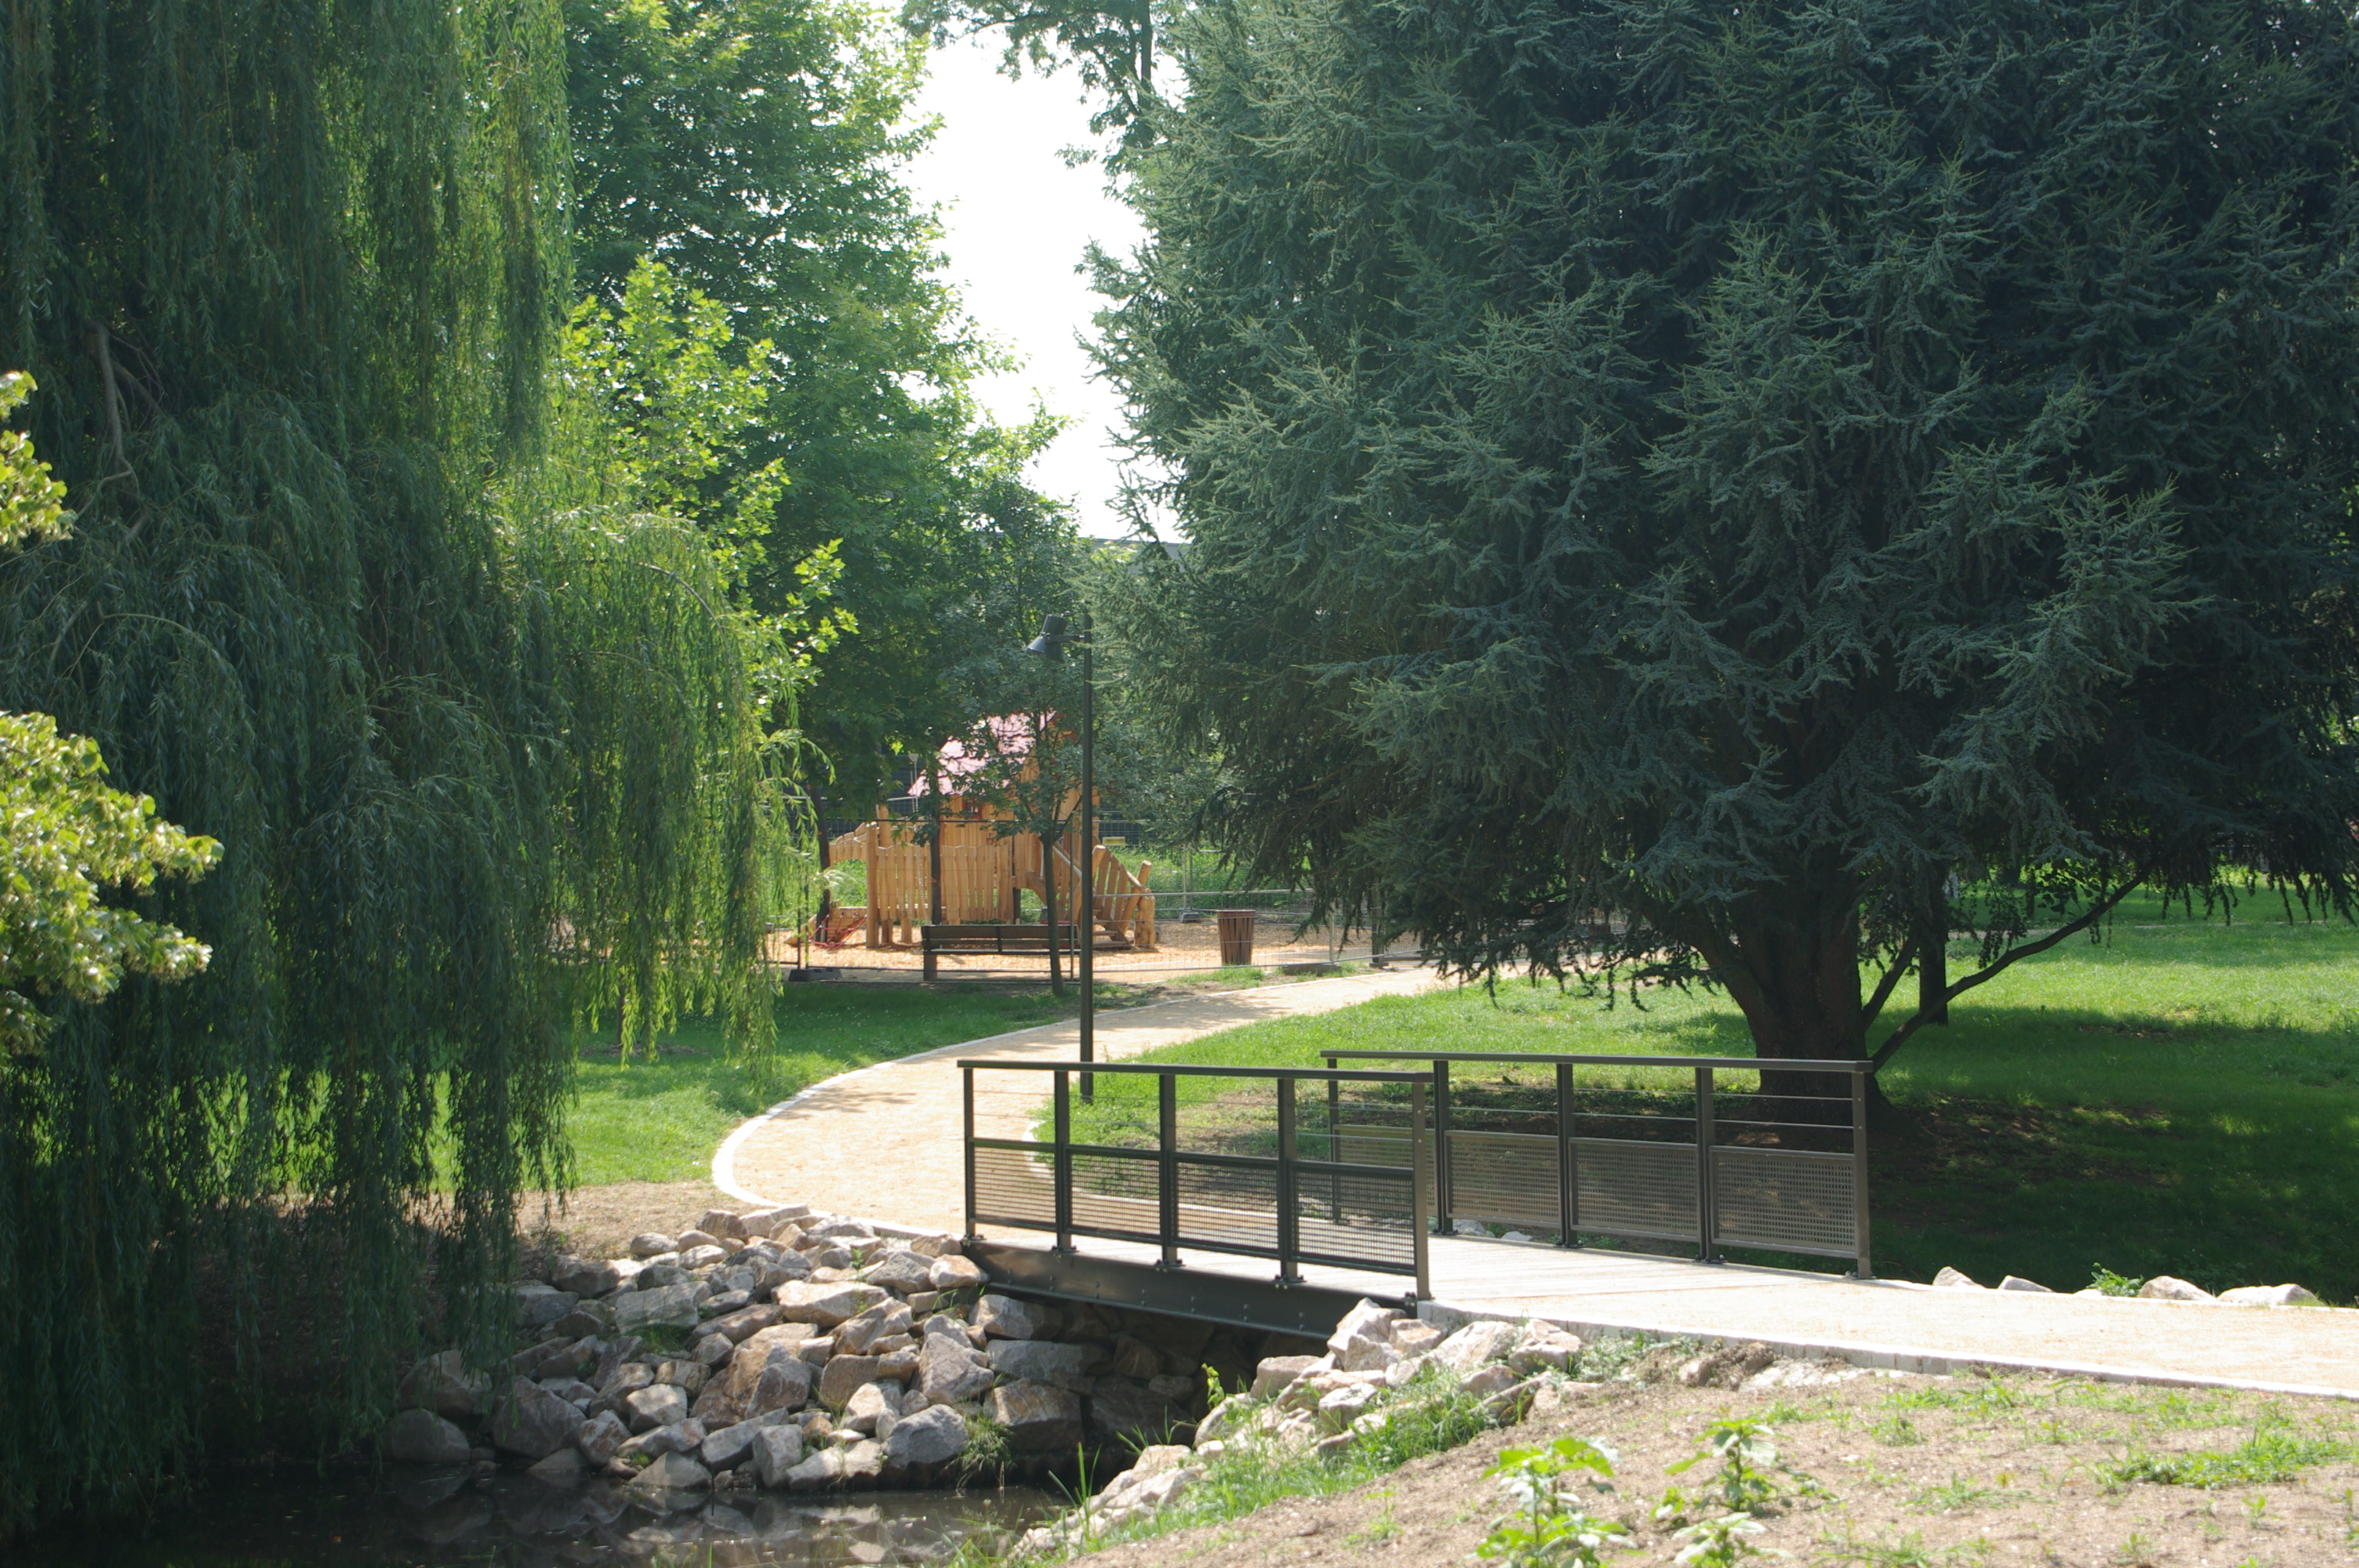 Bischwiller trame verte gallois curie atelier de for Architecte paysagiste alsace